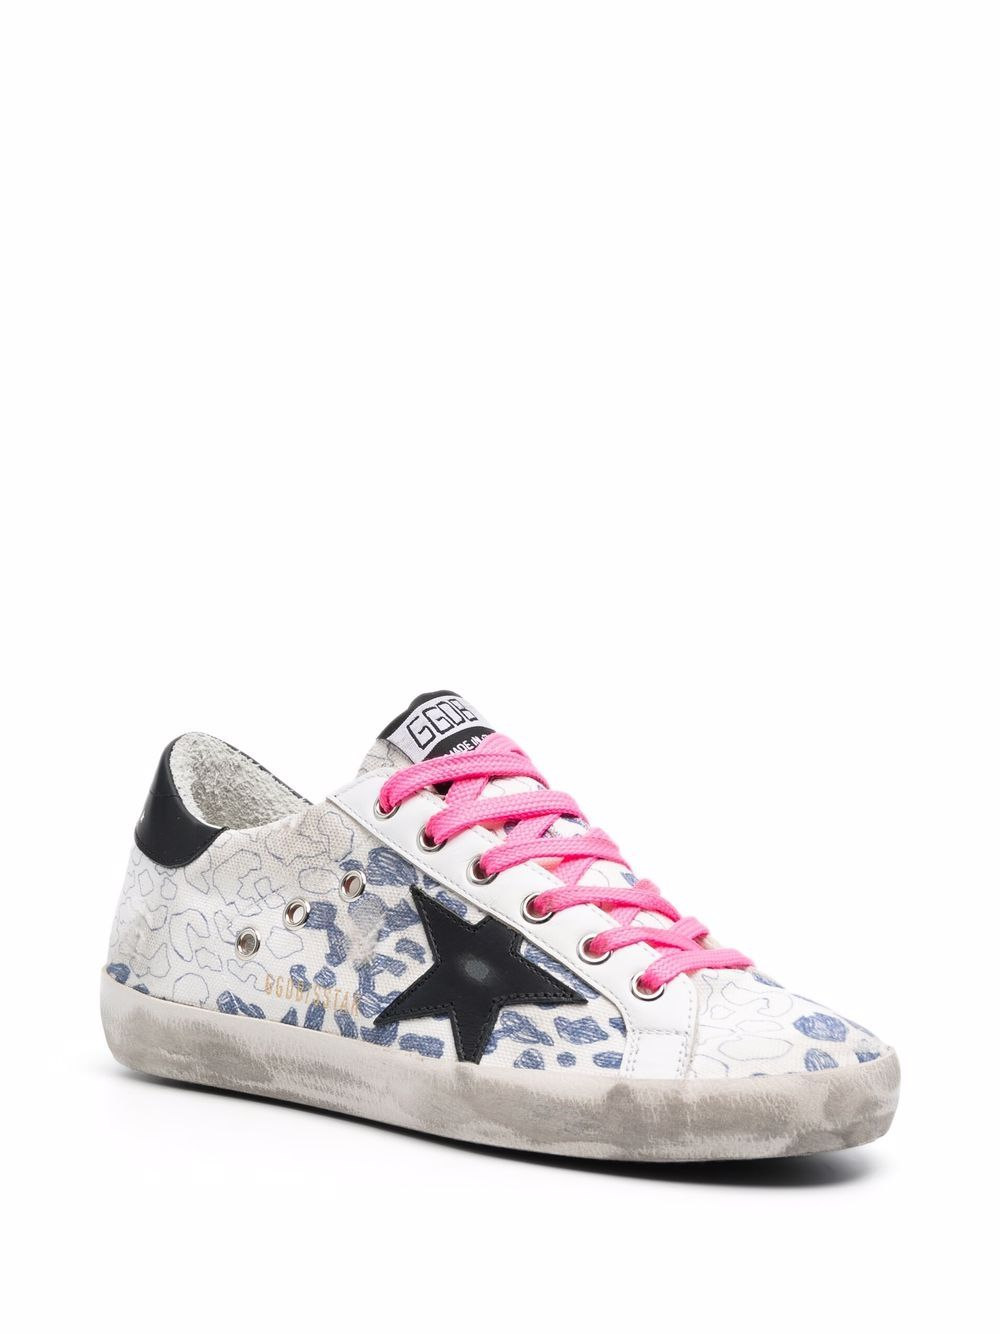 Picture of Golden Goose Deluxe Brand   Super-Star Leopard-Print Sneakers